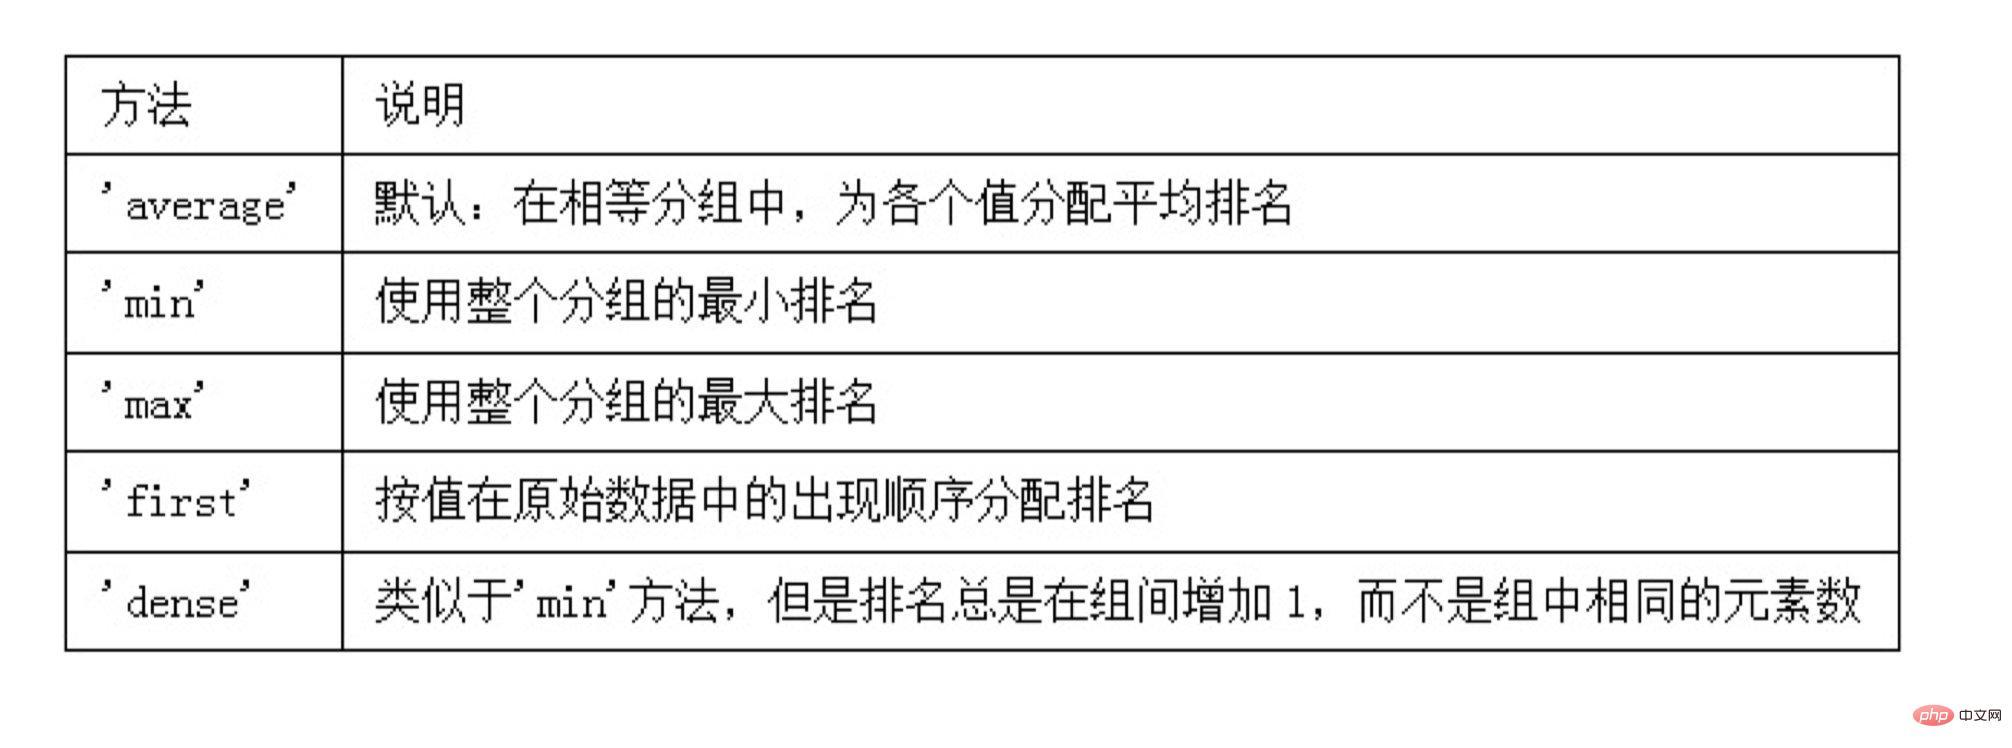 pandas技巧之 DataFrame中的排序与汇总方法_编程技术_编程开发技术教程插图7